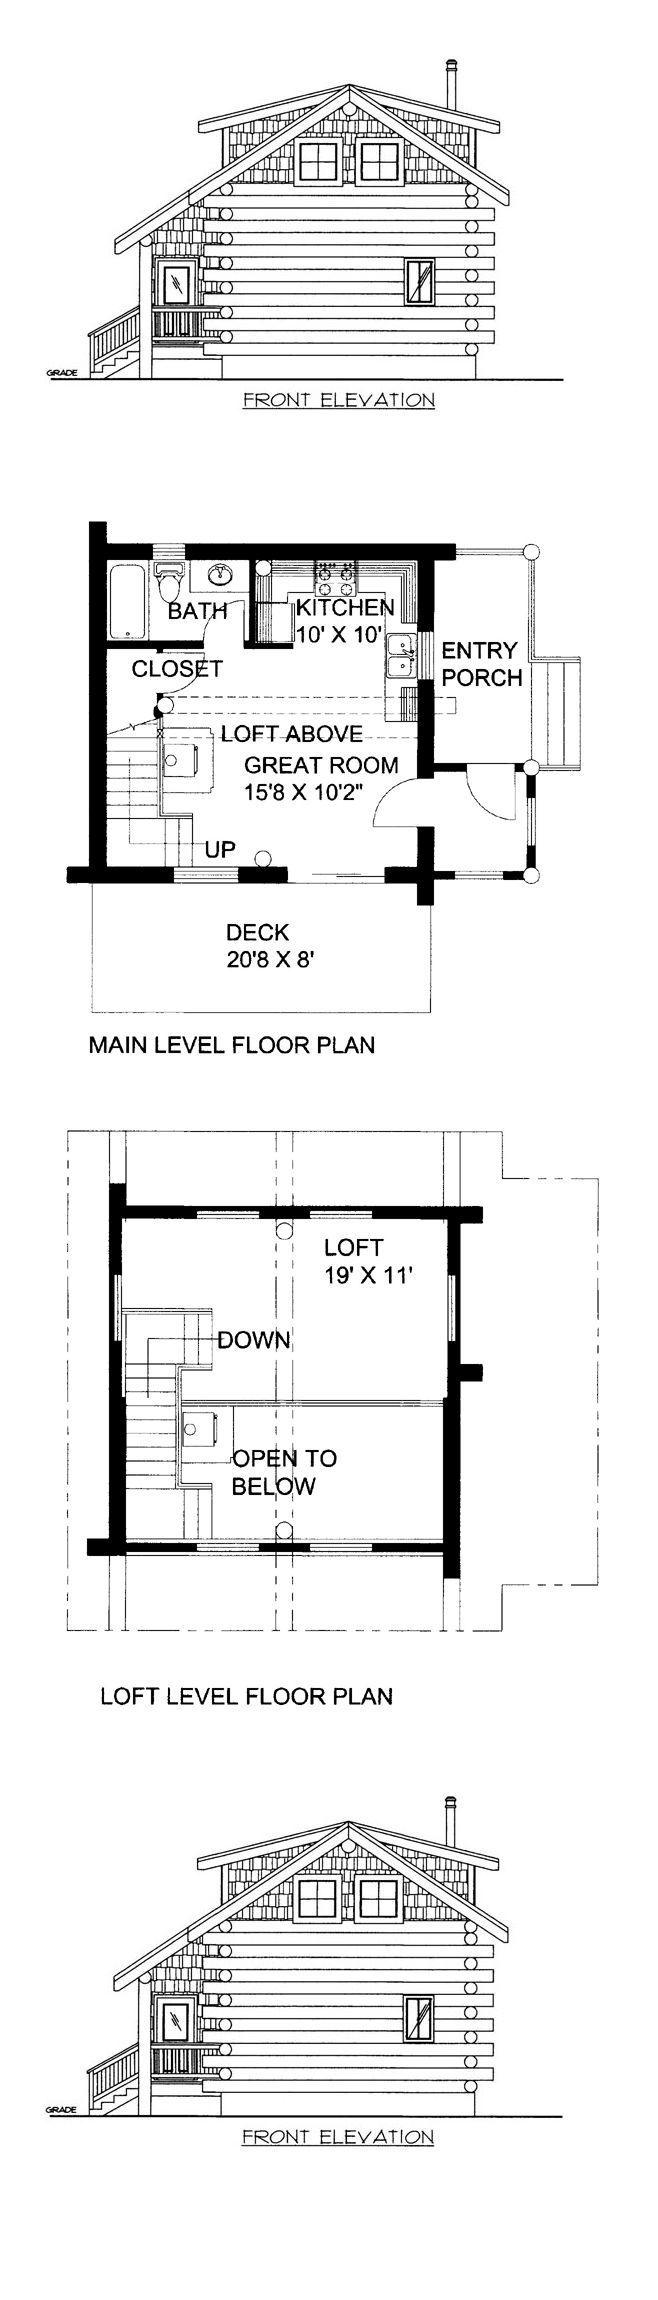 Bachelor 484 sq ft log home kit log cabin kit mountain ridge - Log Home Plan 87143 Total Living Area 640 Sq Ft With One